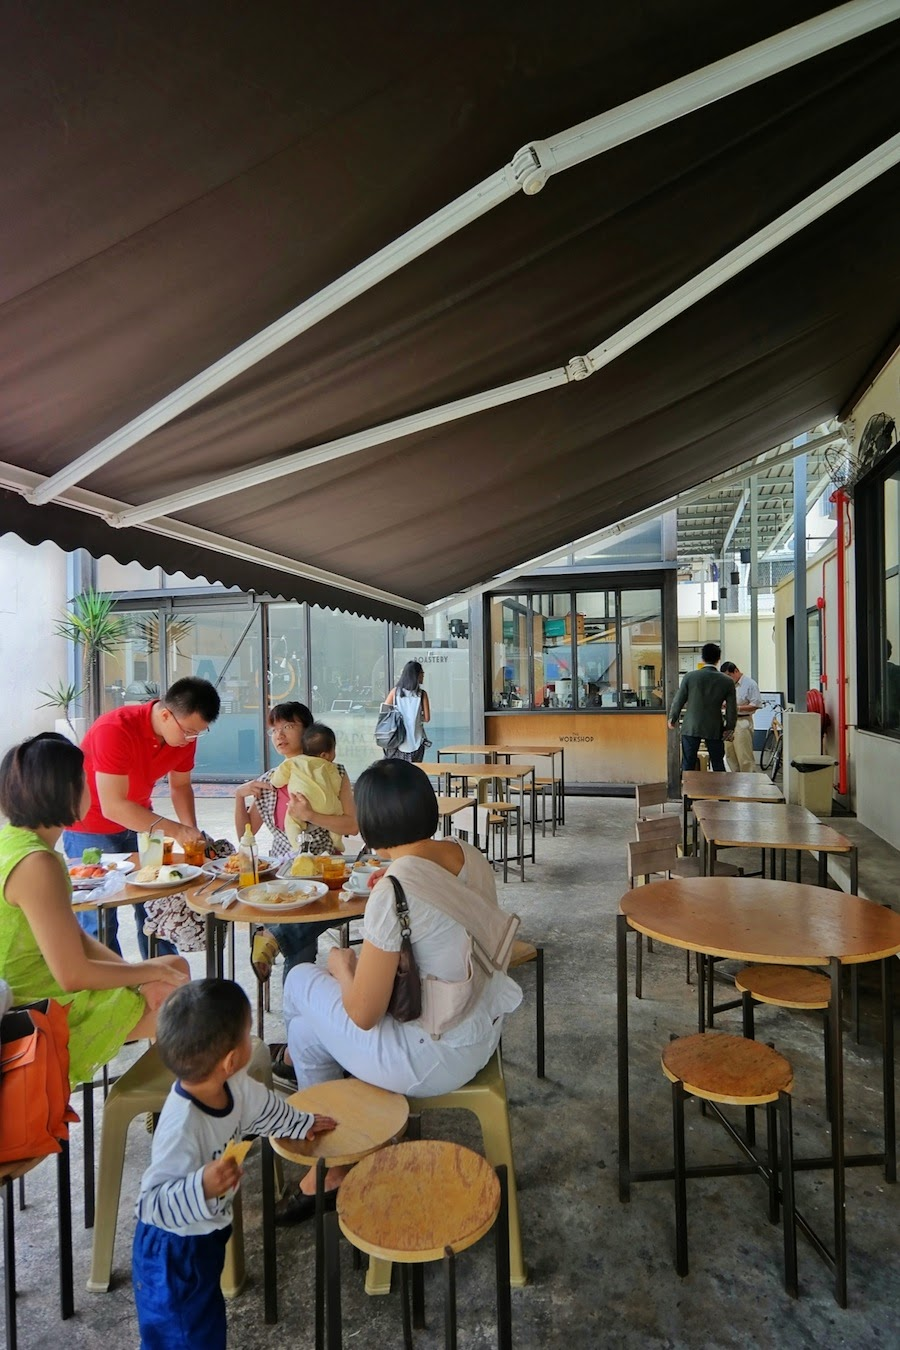 "<a href=""http://mataram.info/things-to-do-in-bali/visitindonesia-banda-marine-life-the-paradise-of-diving-topographic-point-inward-fundamental-maluku/"">Indonesia</a>best destinations : Hardware Java Inwards Singapore"